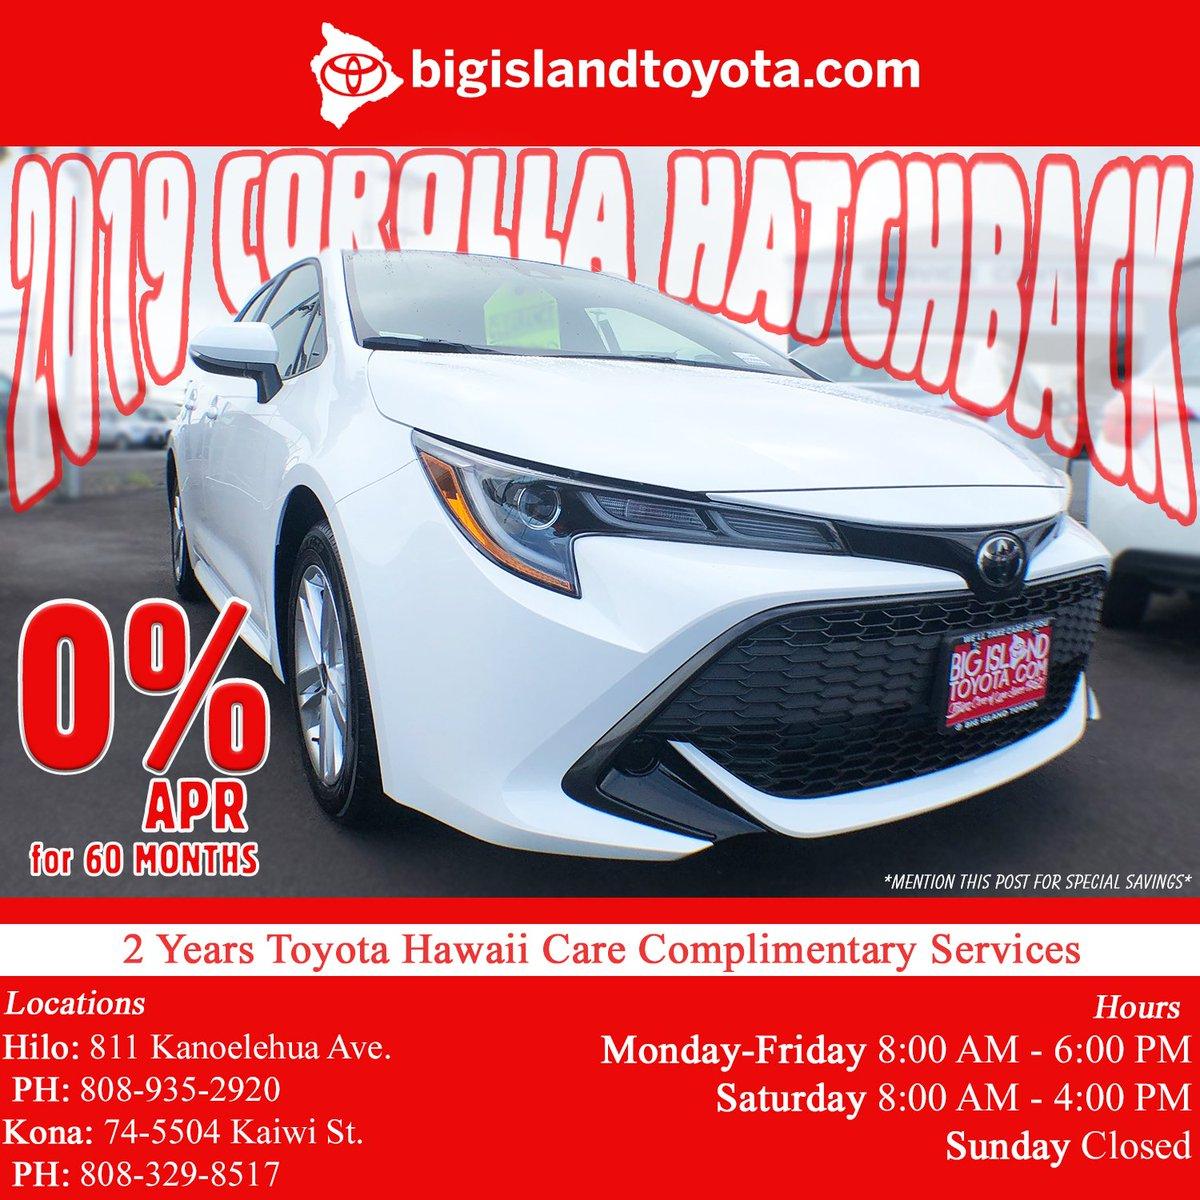 ... Big Island Toyota BigIslandToyota Twitter